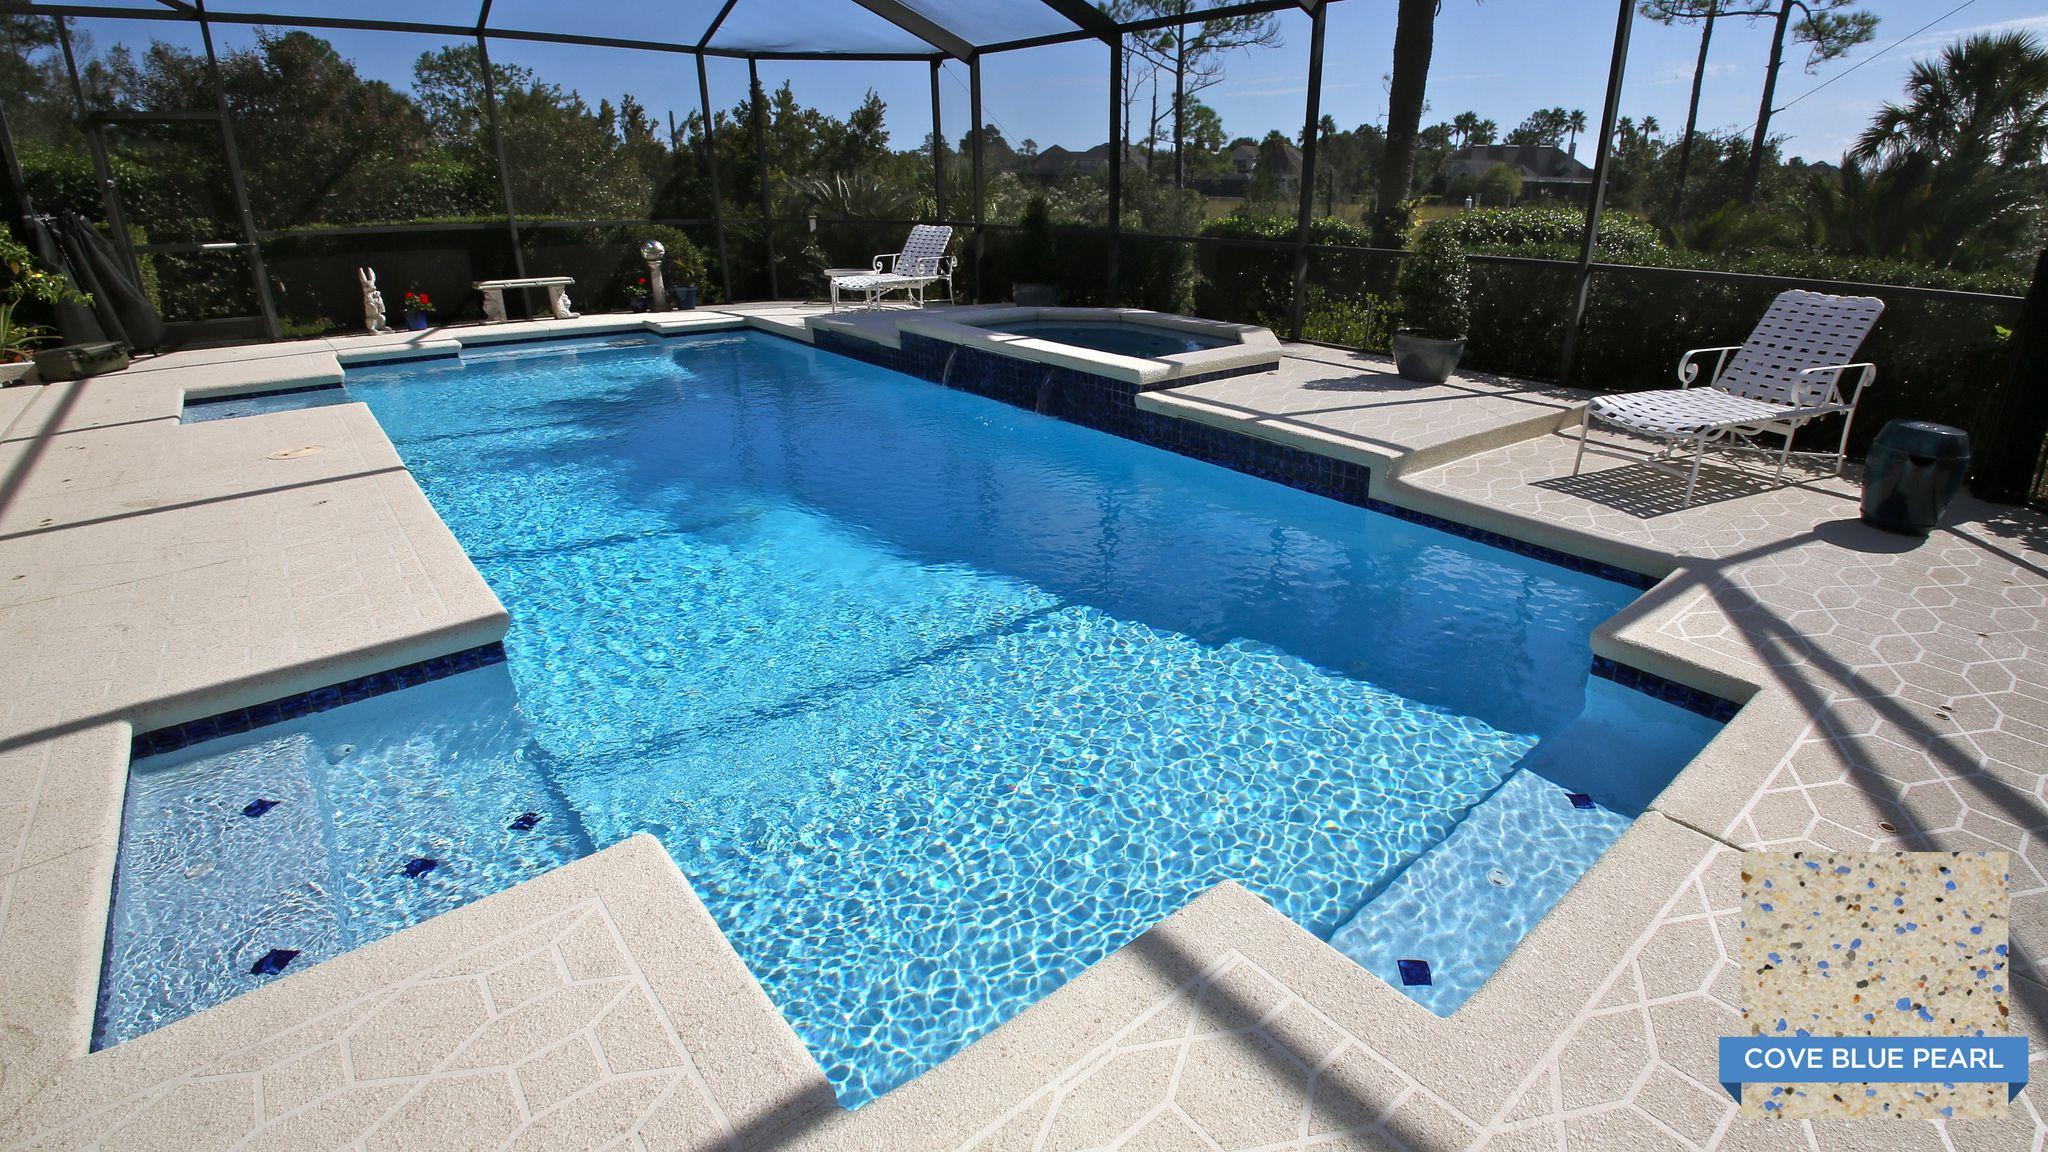 Sunstone Pearl Cove Blue even looks great in backyard ...